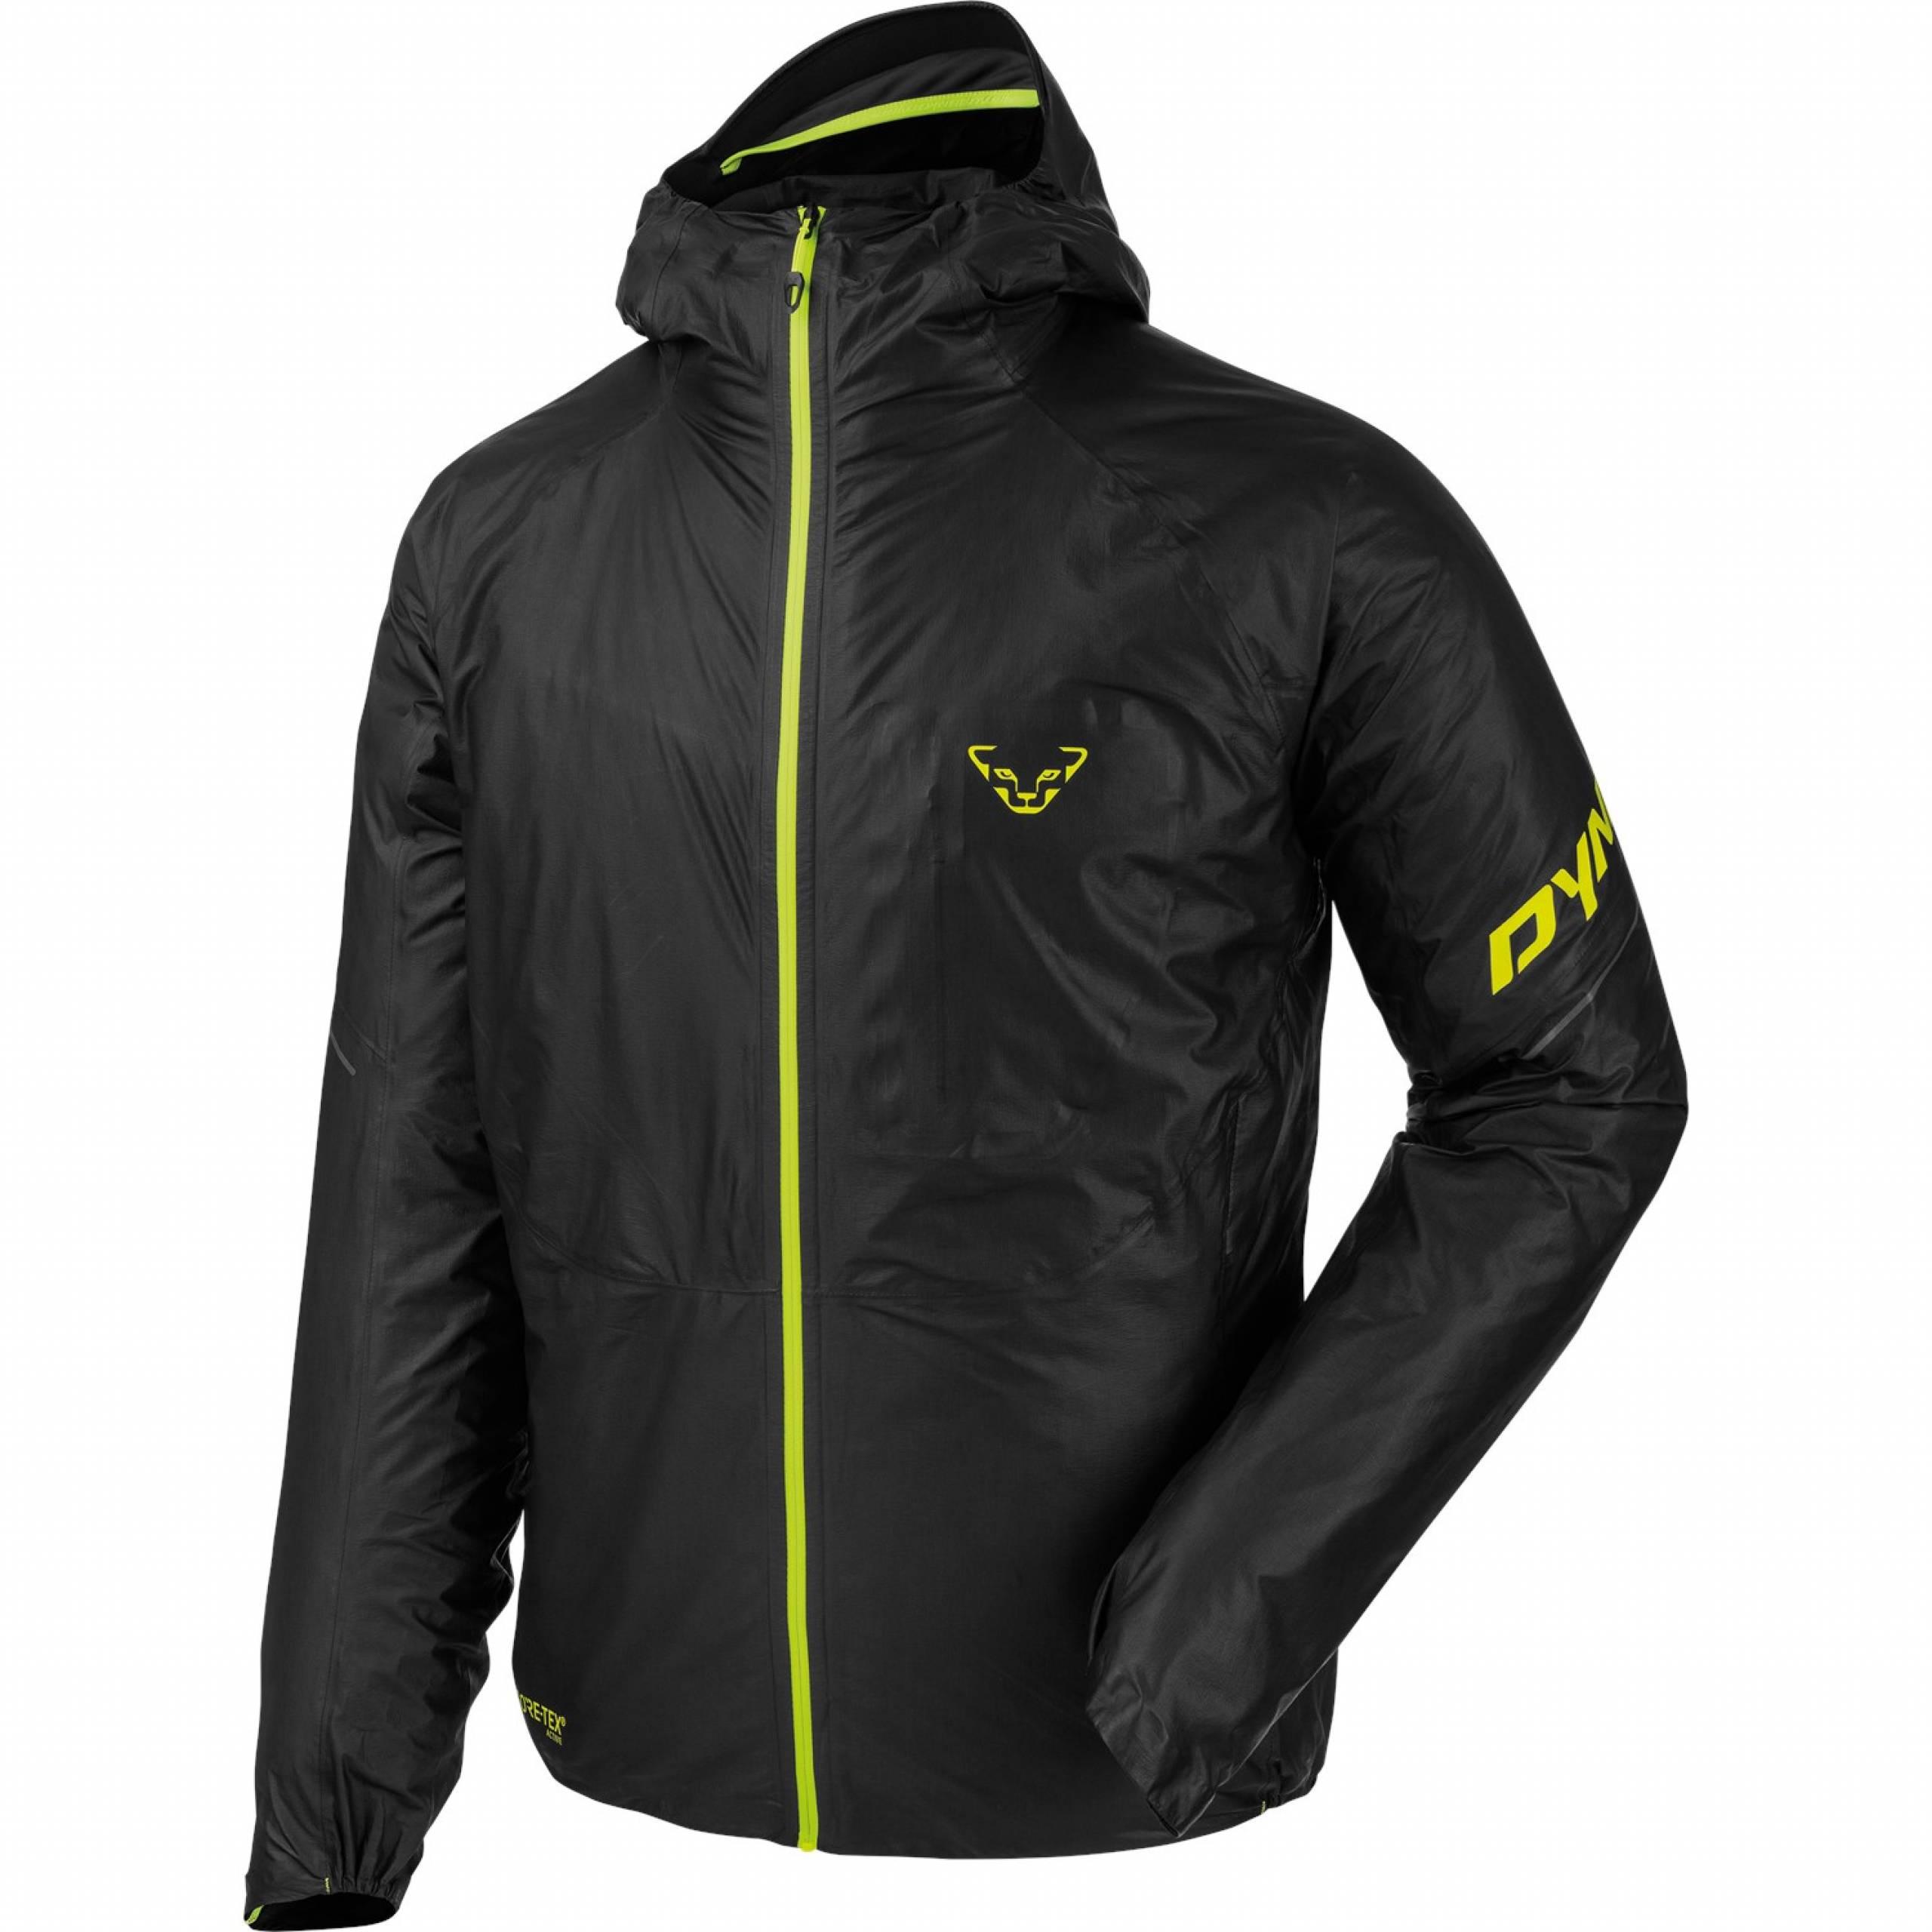 Hardshell jacket men s ski touring and trail running